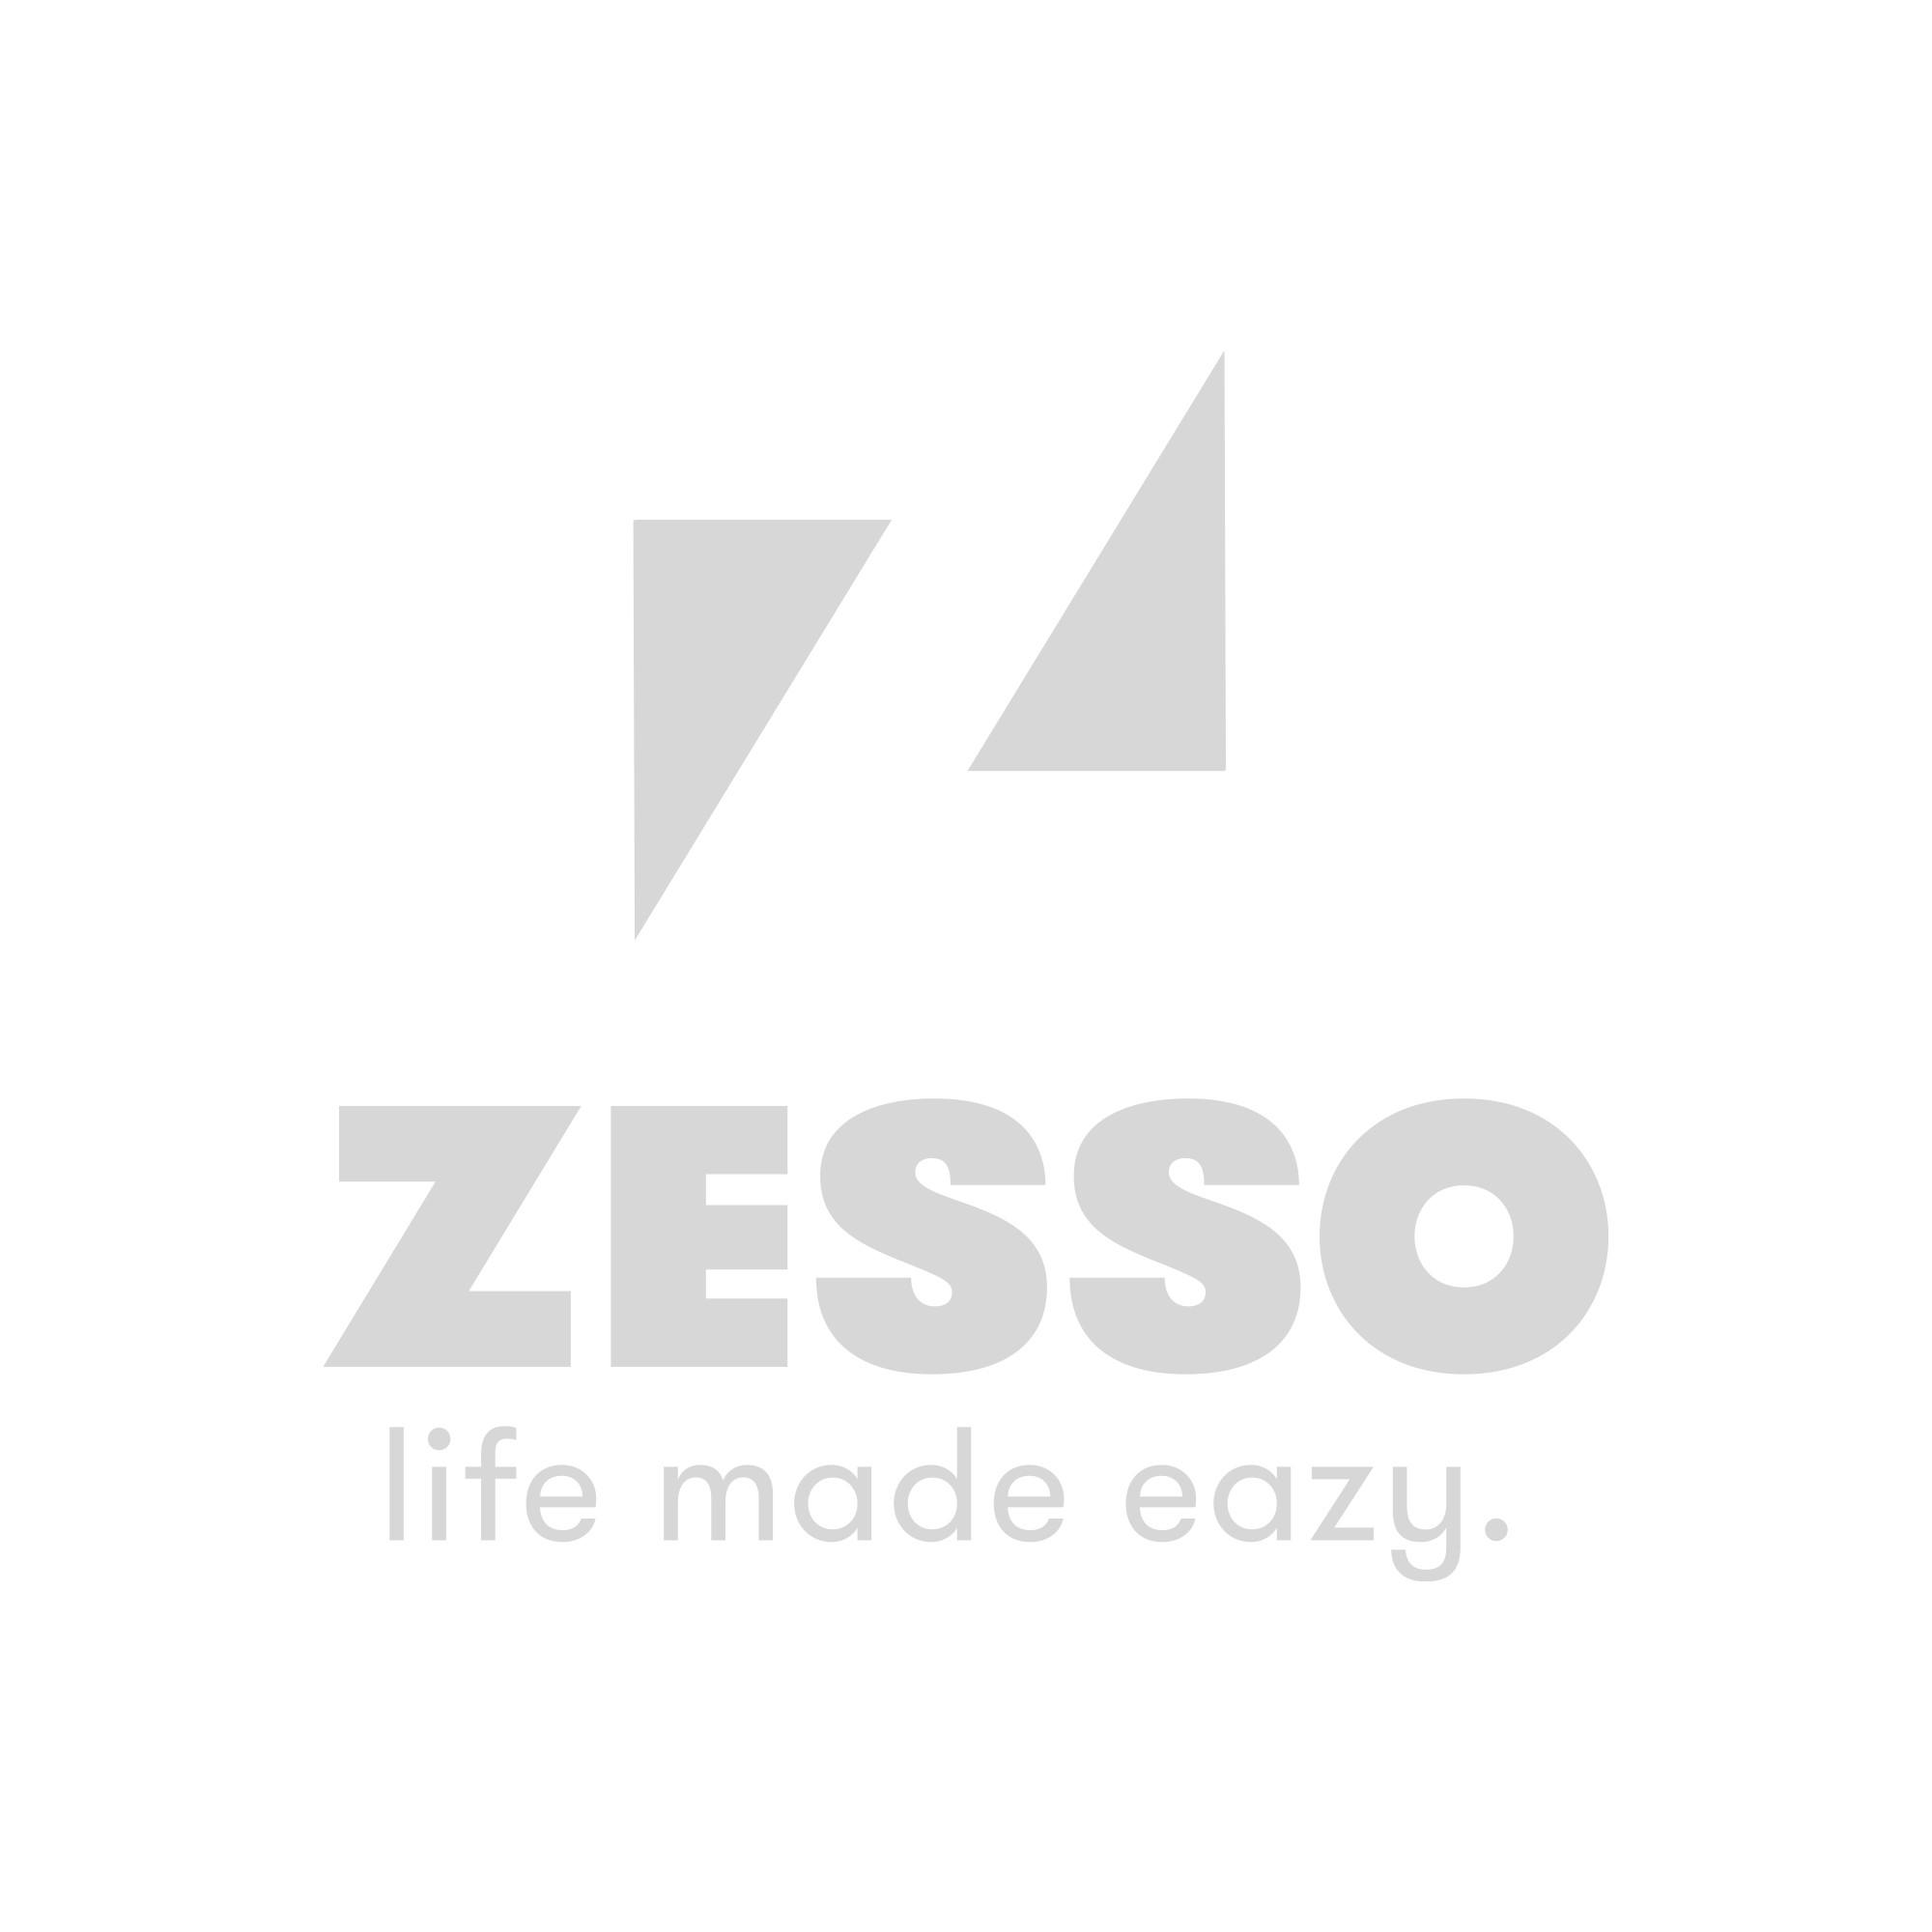 Reer 2in1 Digitale Hygrometer & Thermometer HygroTemp